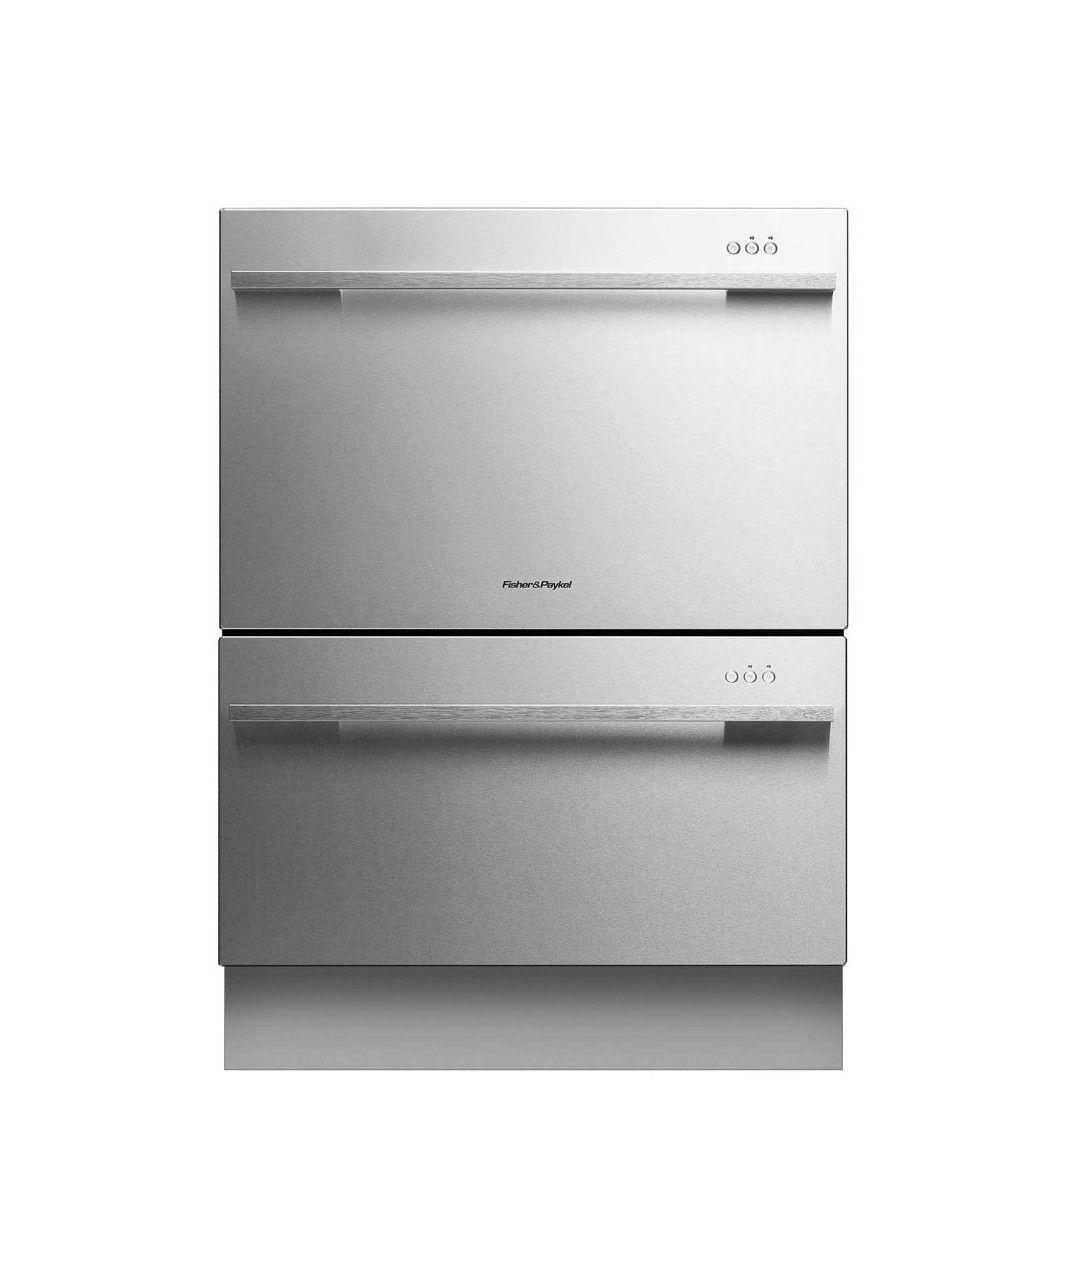 kitchenaid double drawer dishwasher kudd03dtss